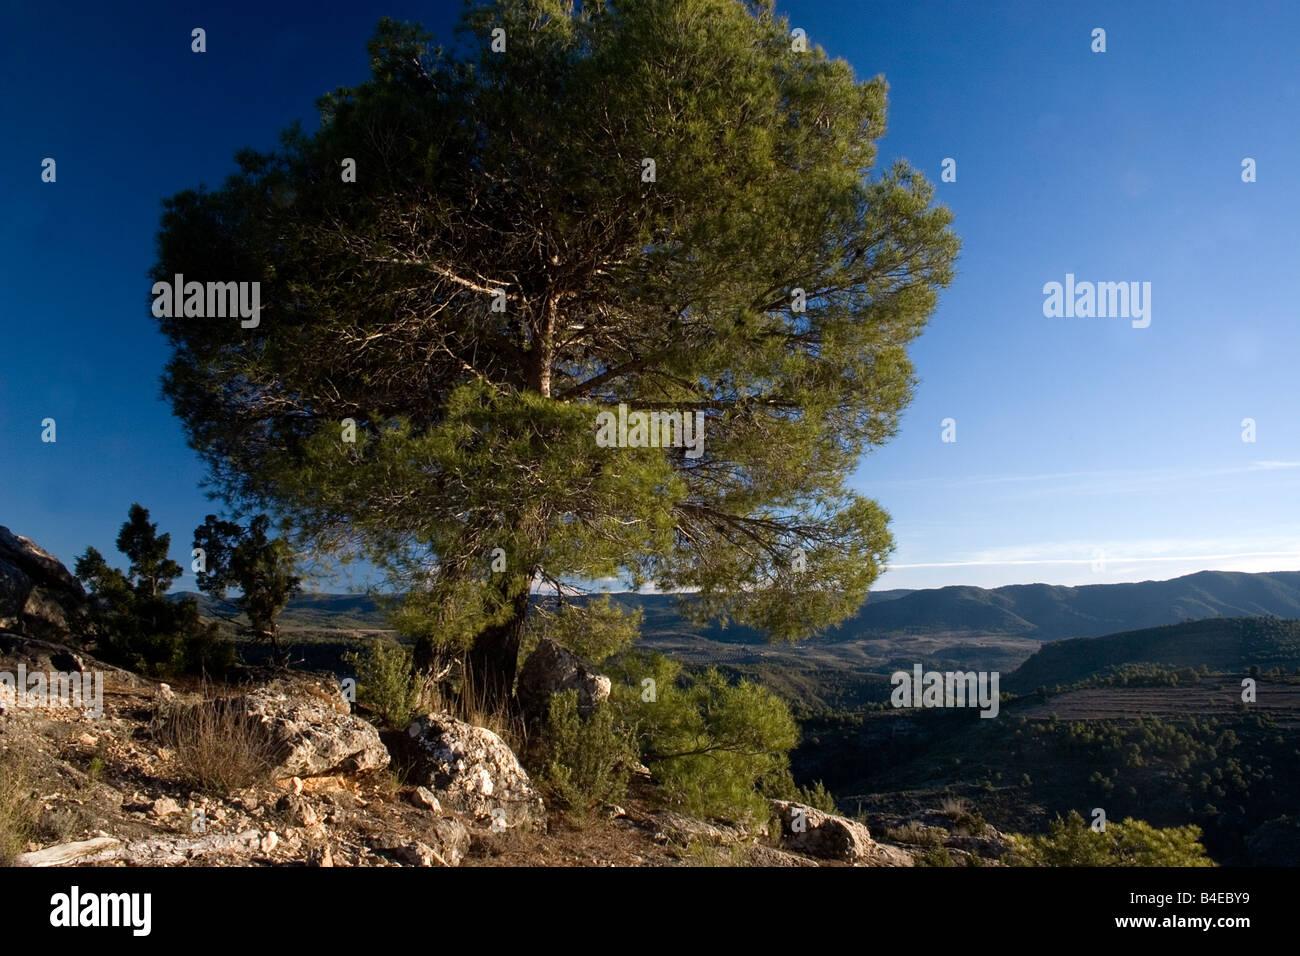 pina carasca pine tree in Sierra de Seguras Juan Quiles Castilla la Mancha Spain - Stock Image